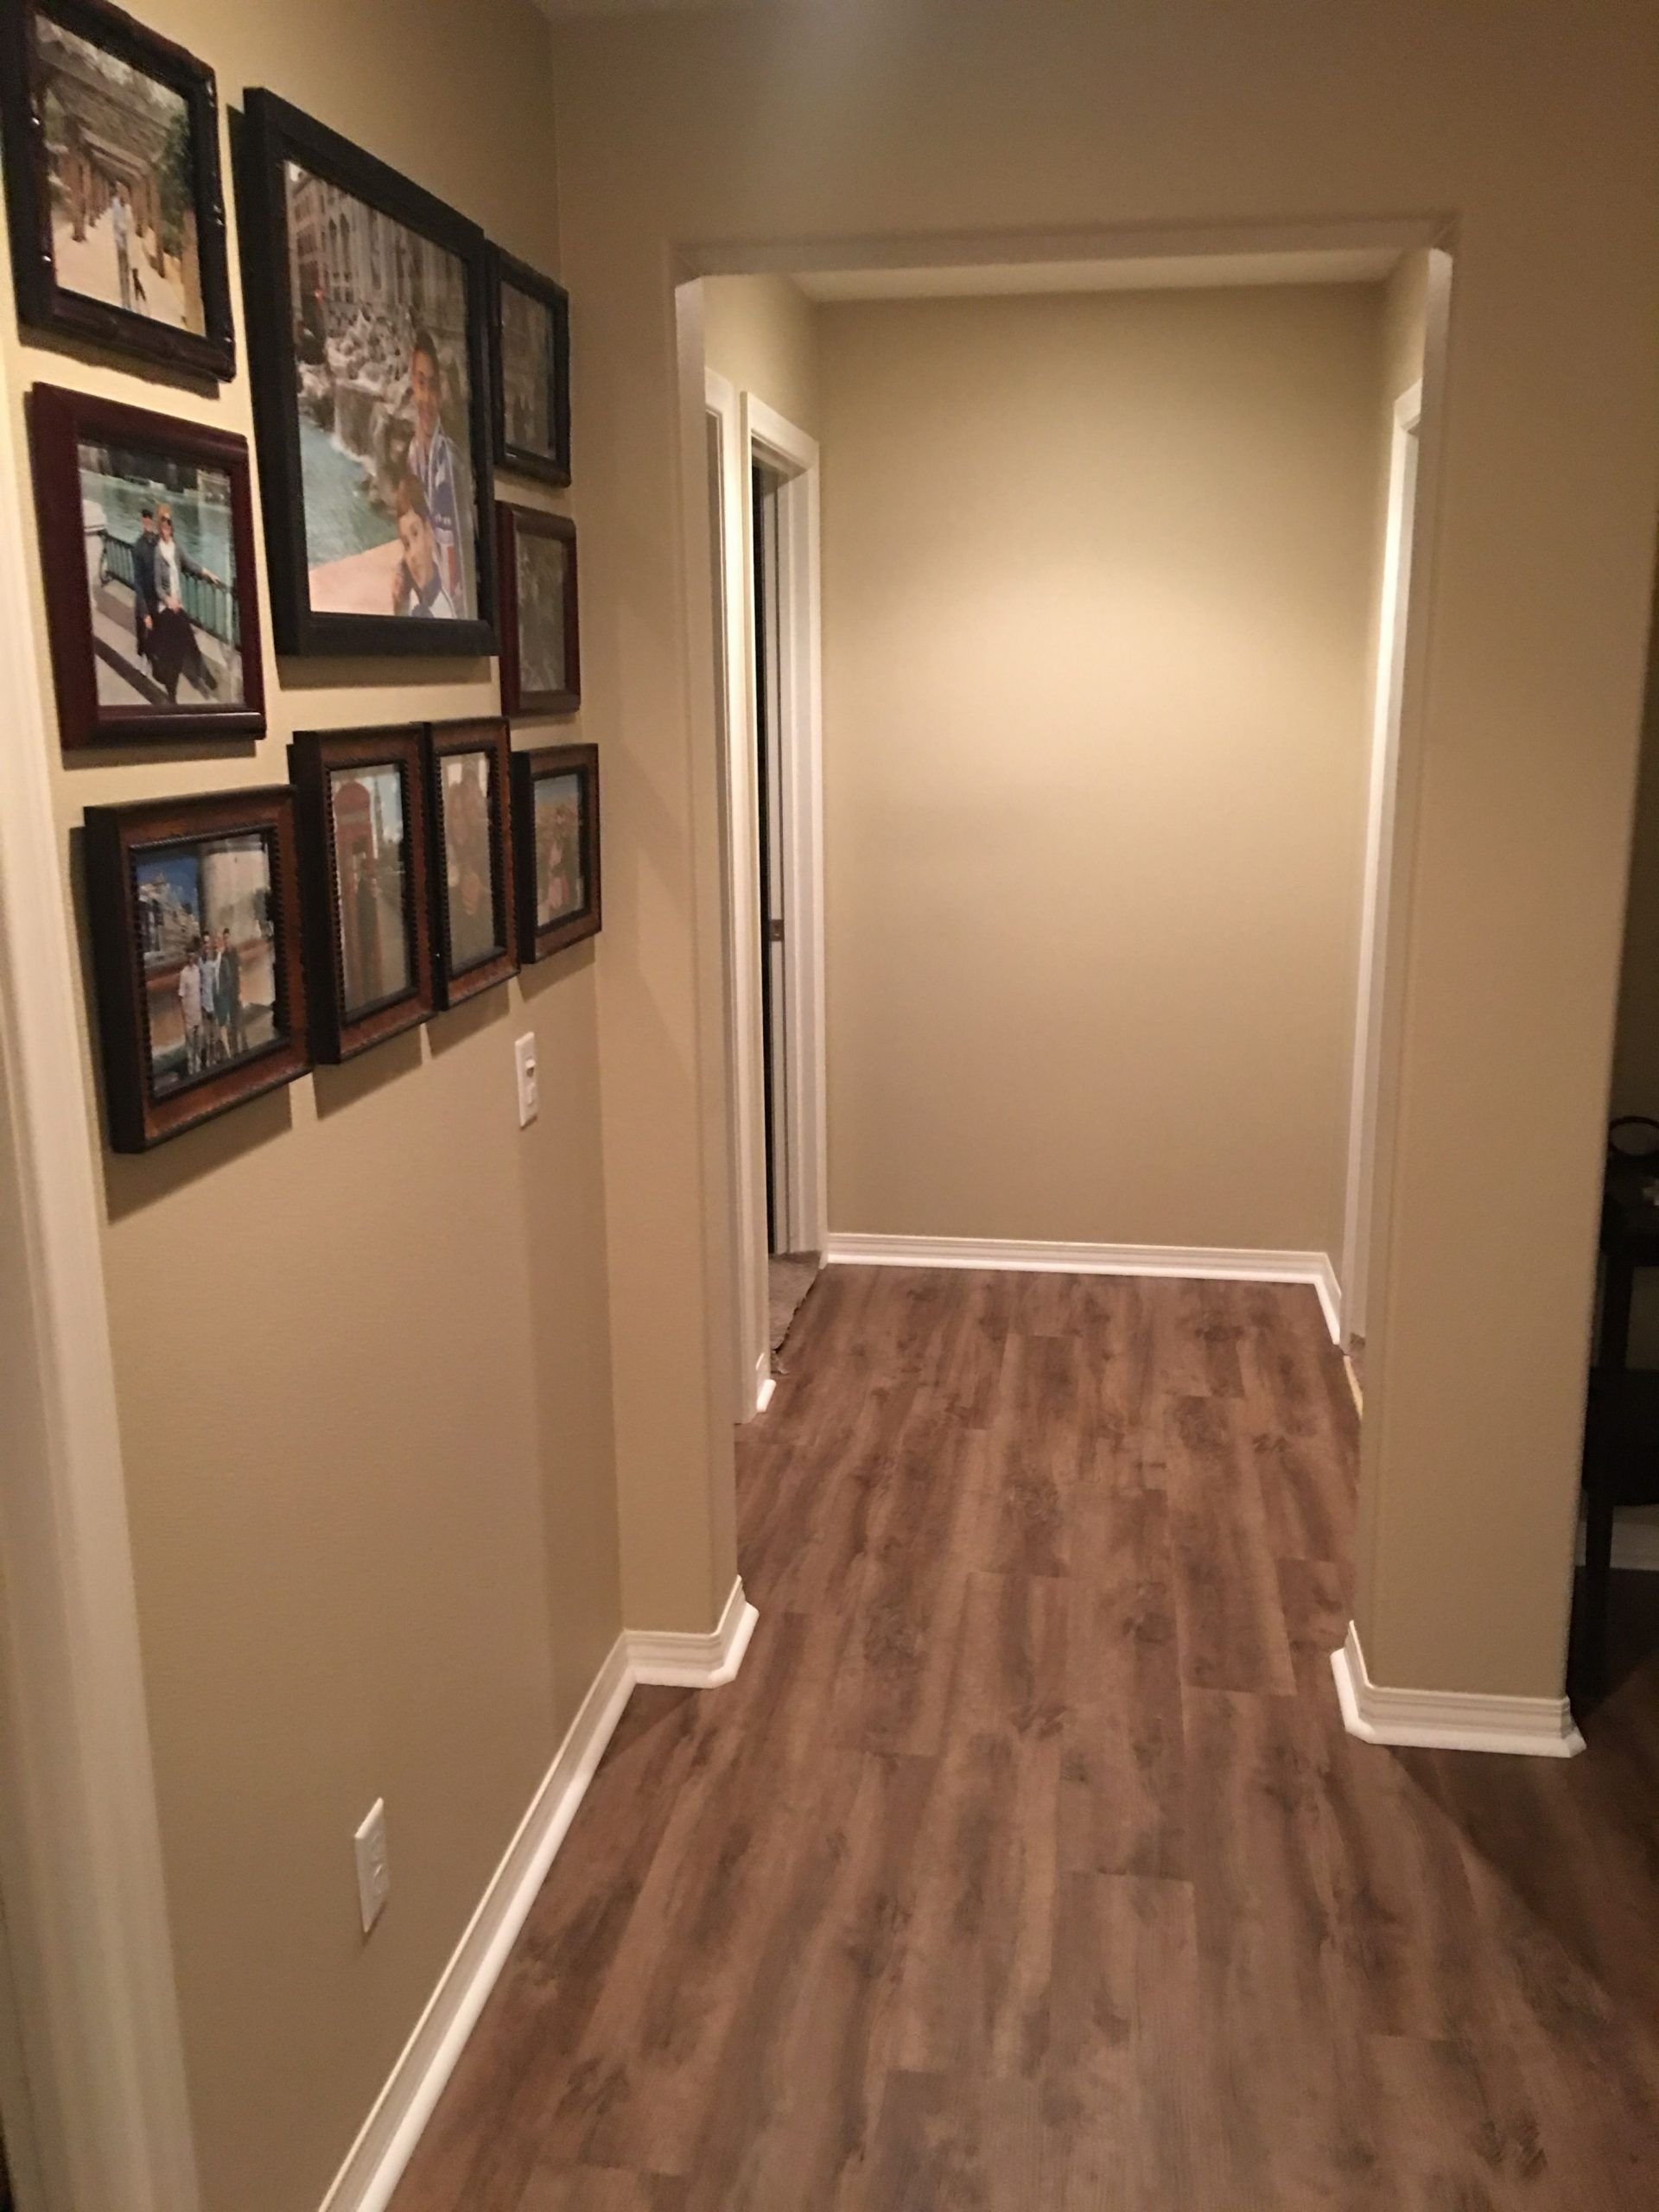 Bedroom Flooring Different Than Hallway